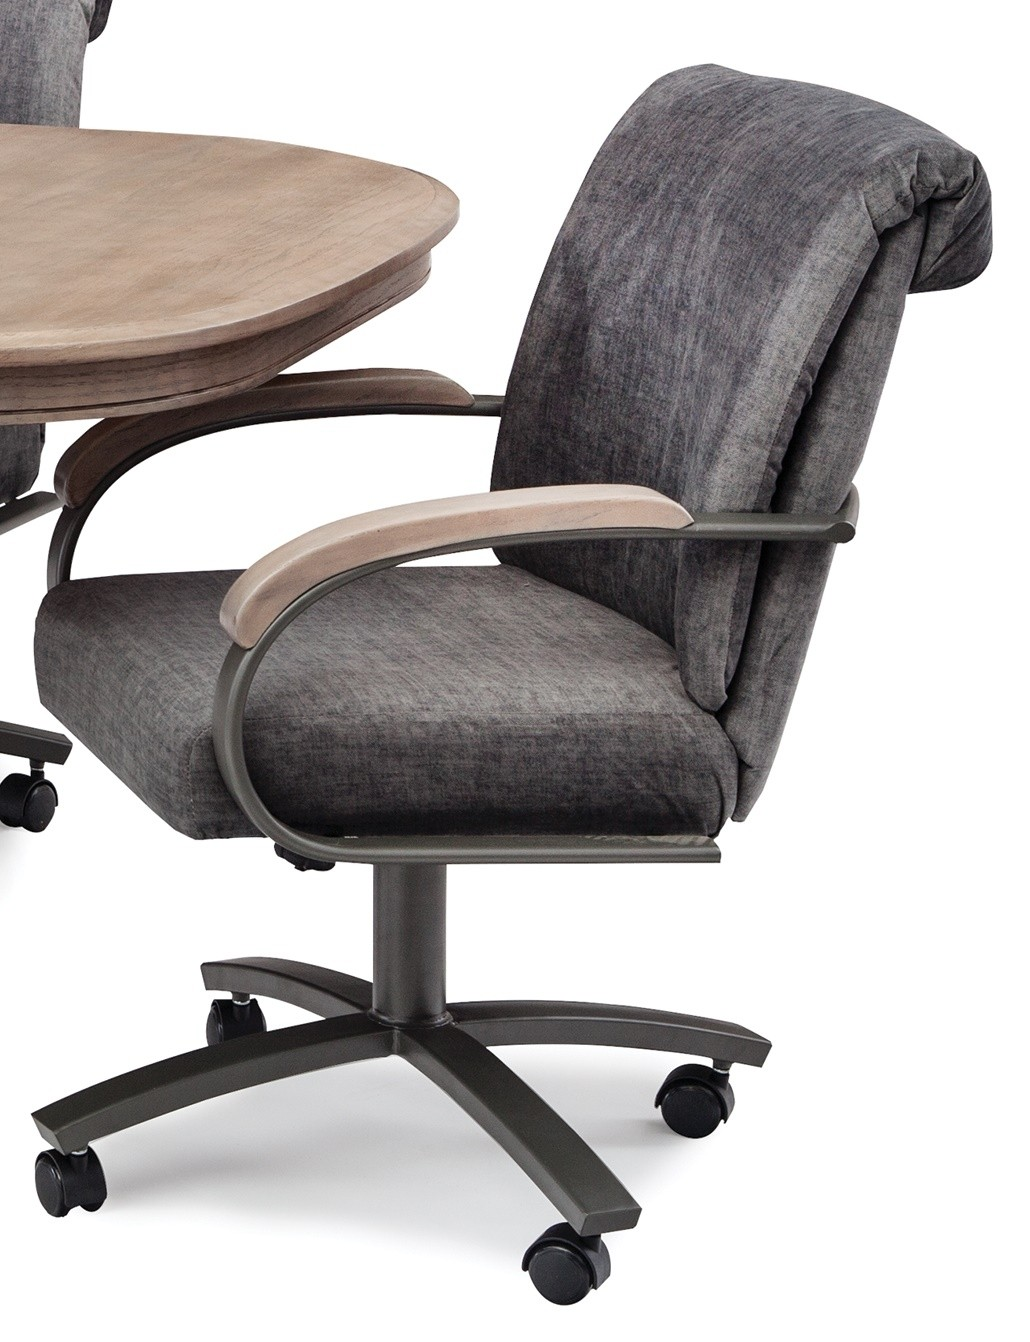 Chromcraft Metalcraft G Amp D Swivel Tilt Caster Arm Chair